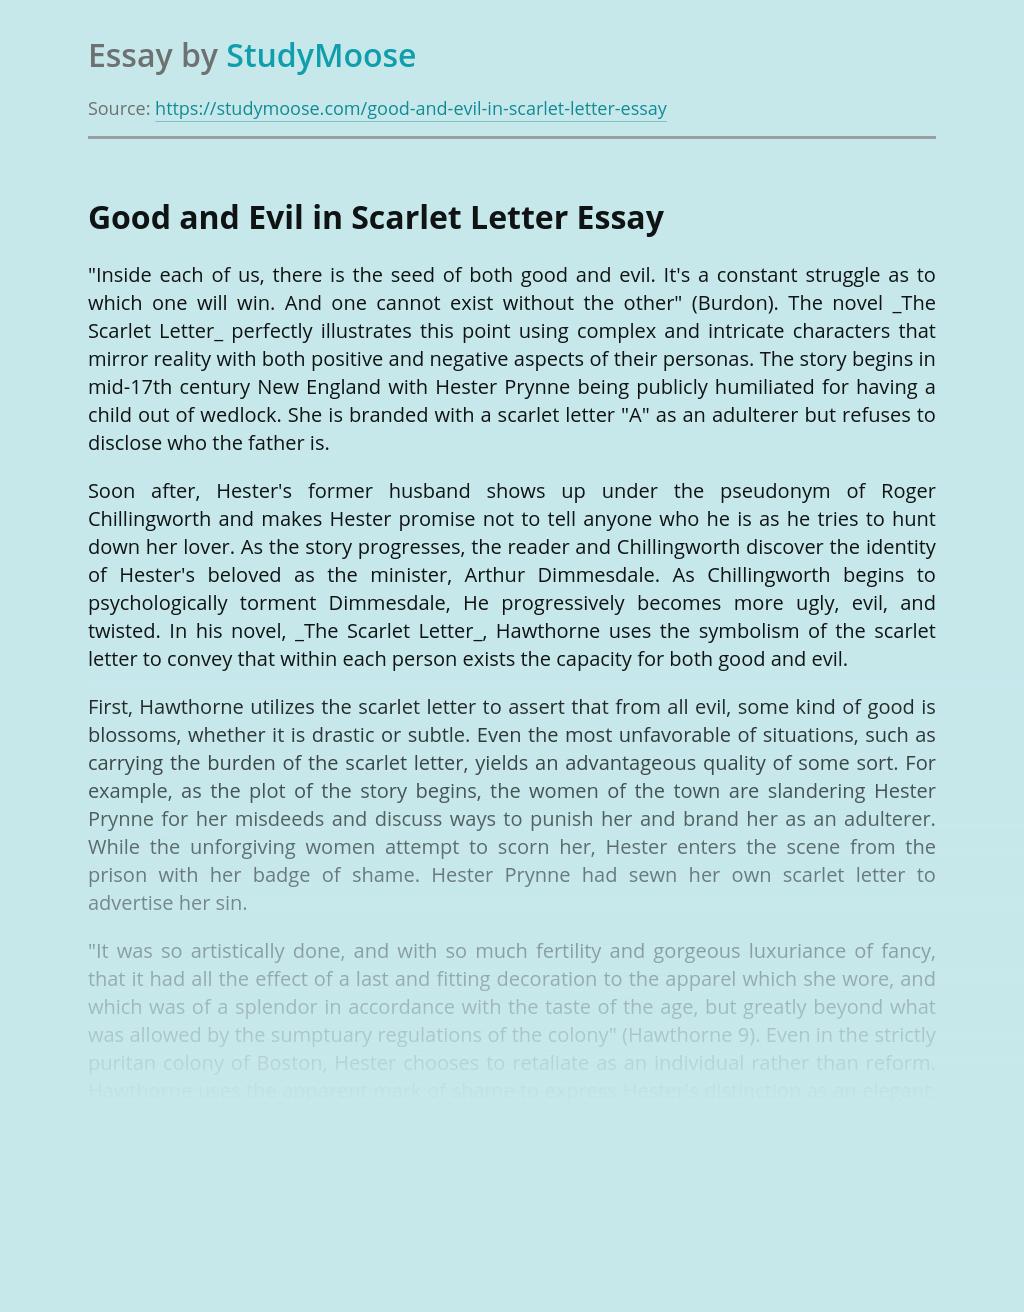 Good and Evil in Scarlet Letter